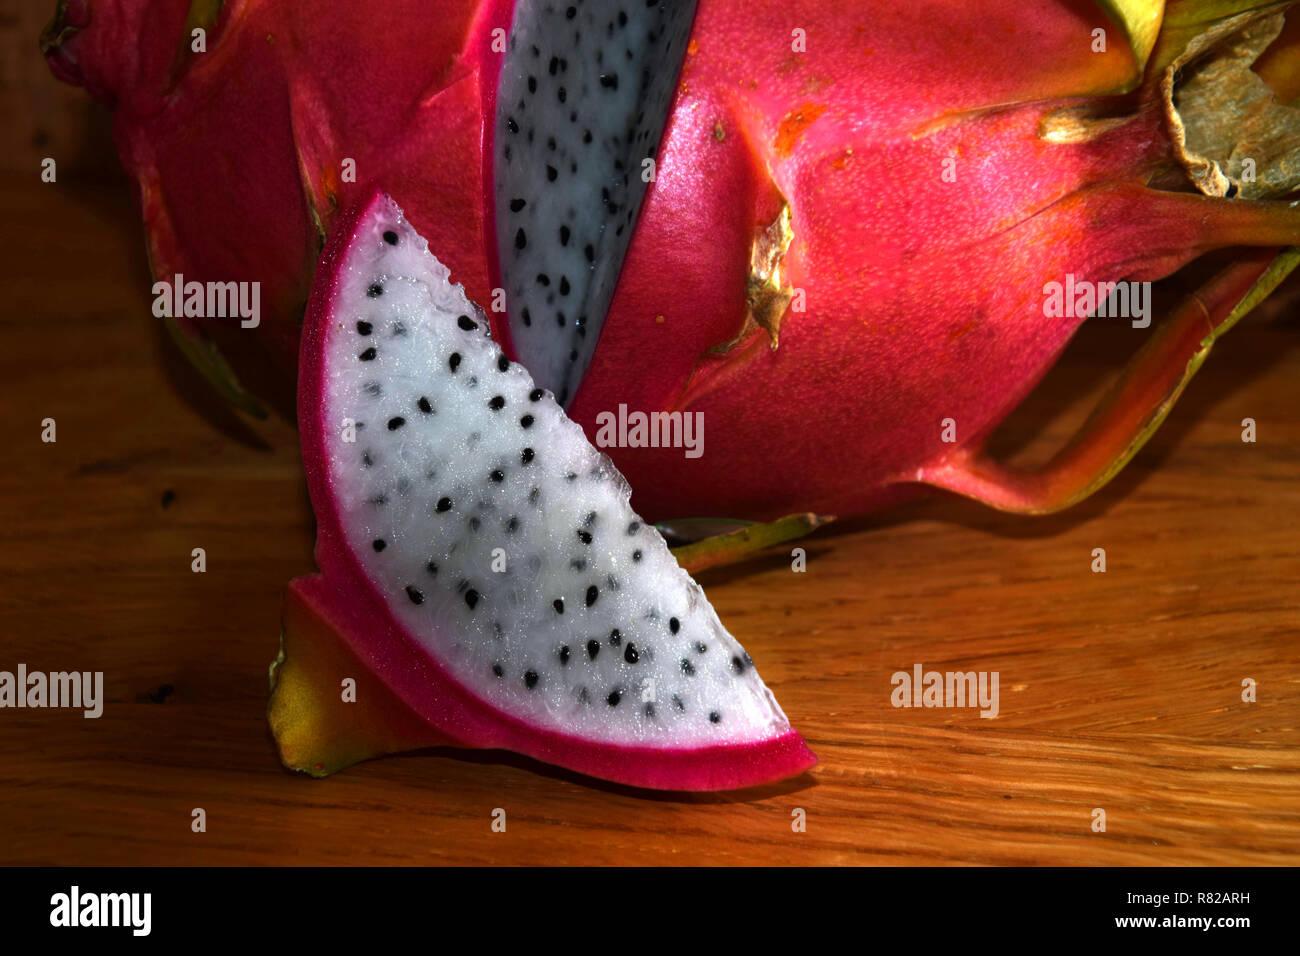 pitaya blanca or white-fleshed and pink-skinned ripe pitahaya fruit also called hylocereus undatus on wooden table, slices of ripe dragonfruit - Stock Image